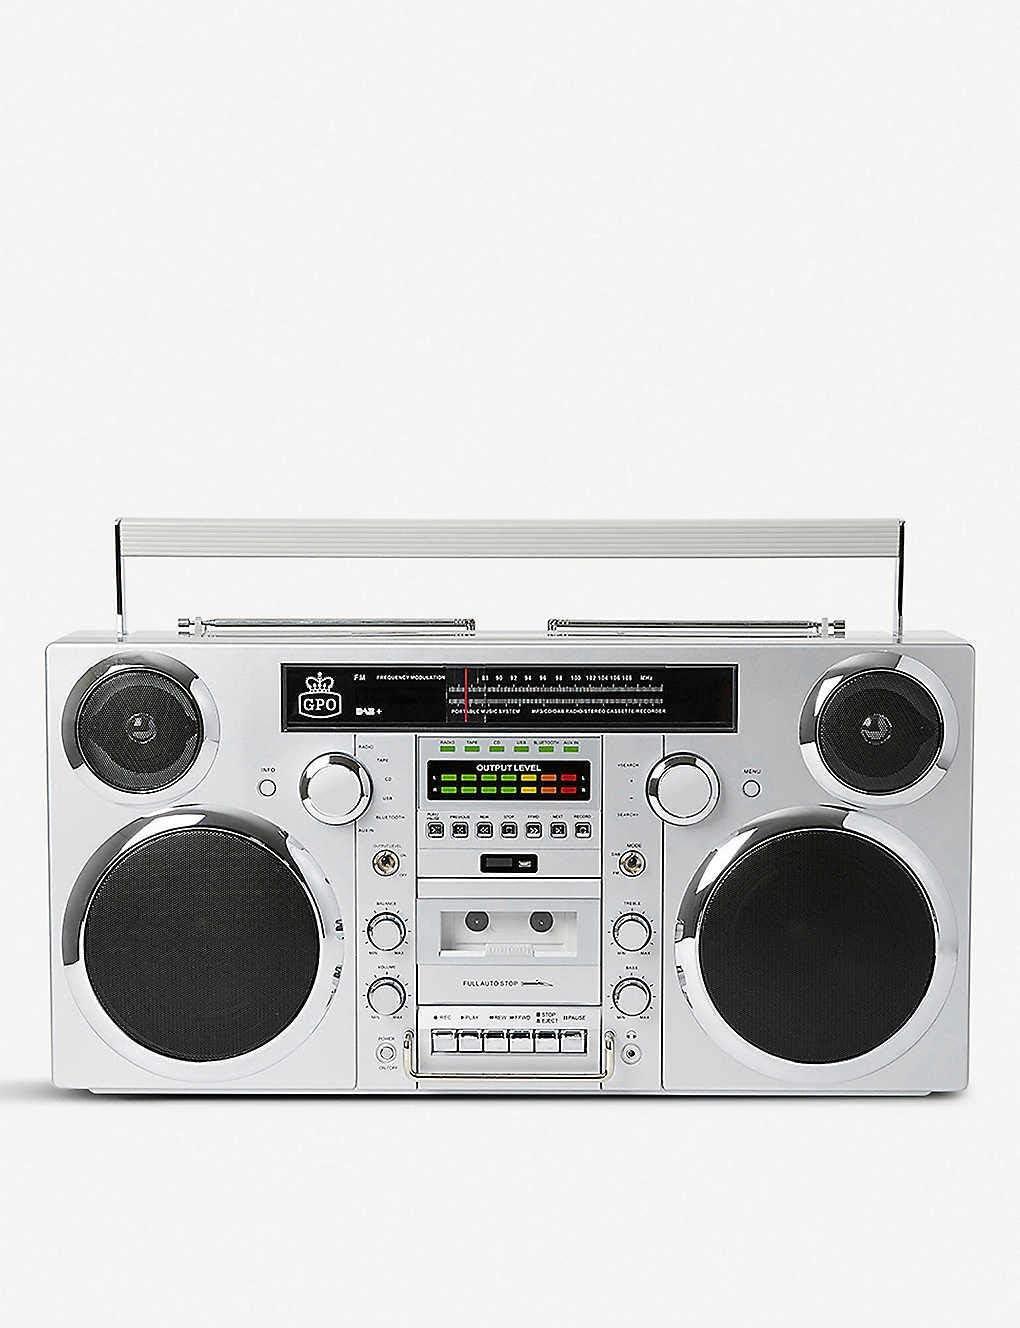 GPO Brooklyn 1980S-Style Portable Boombox - CD Player, Cassette Player, FM & DAB+ Radio, USB, Wireless Bluetooth Speaker - Silver